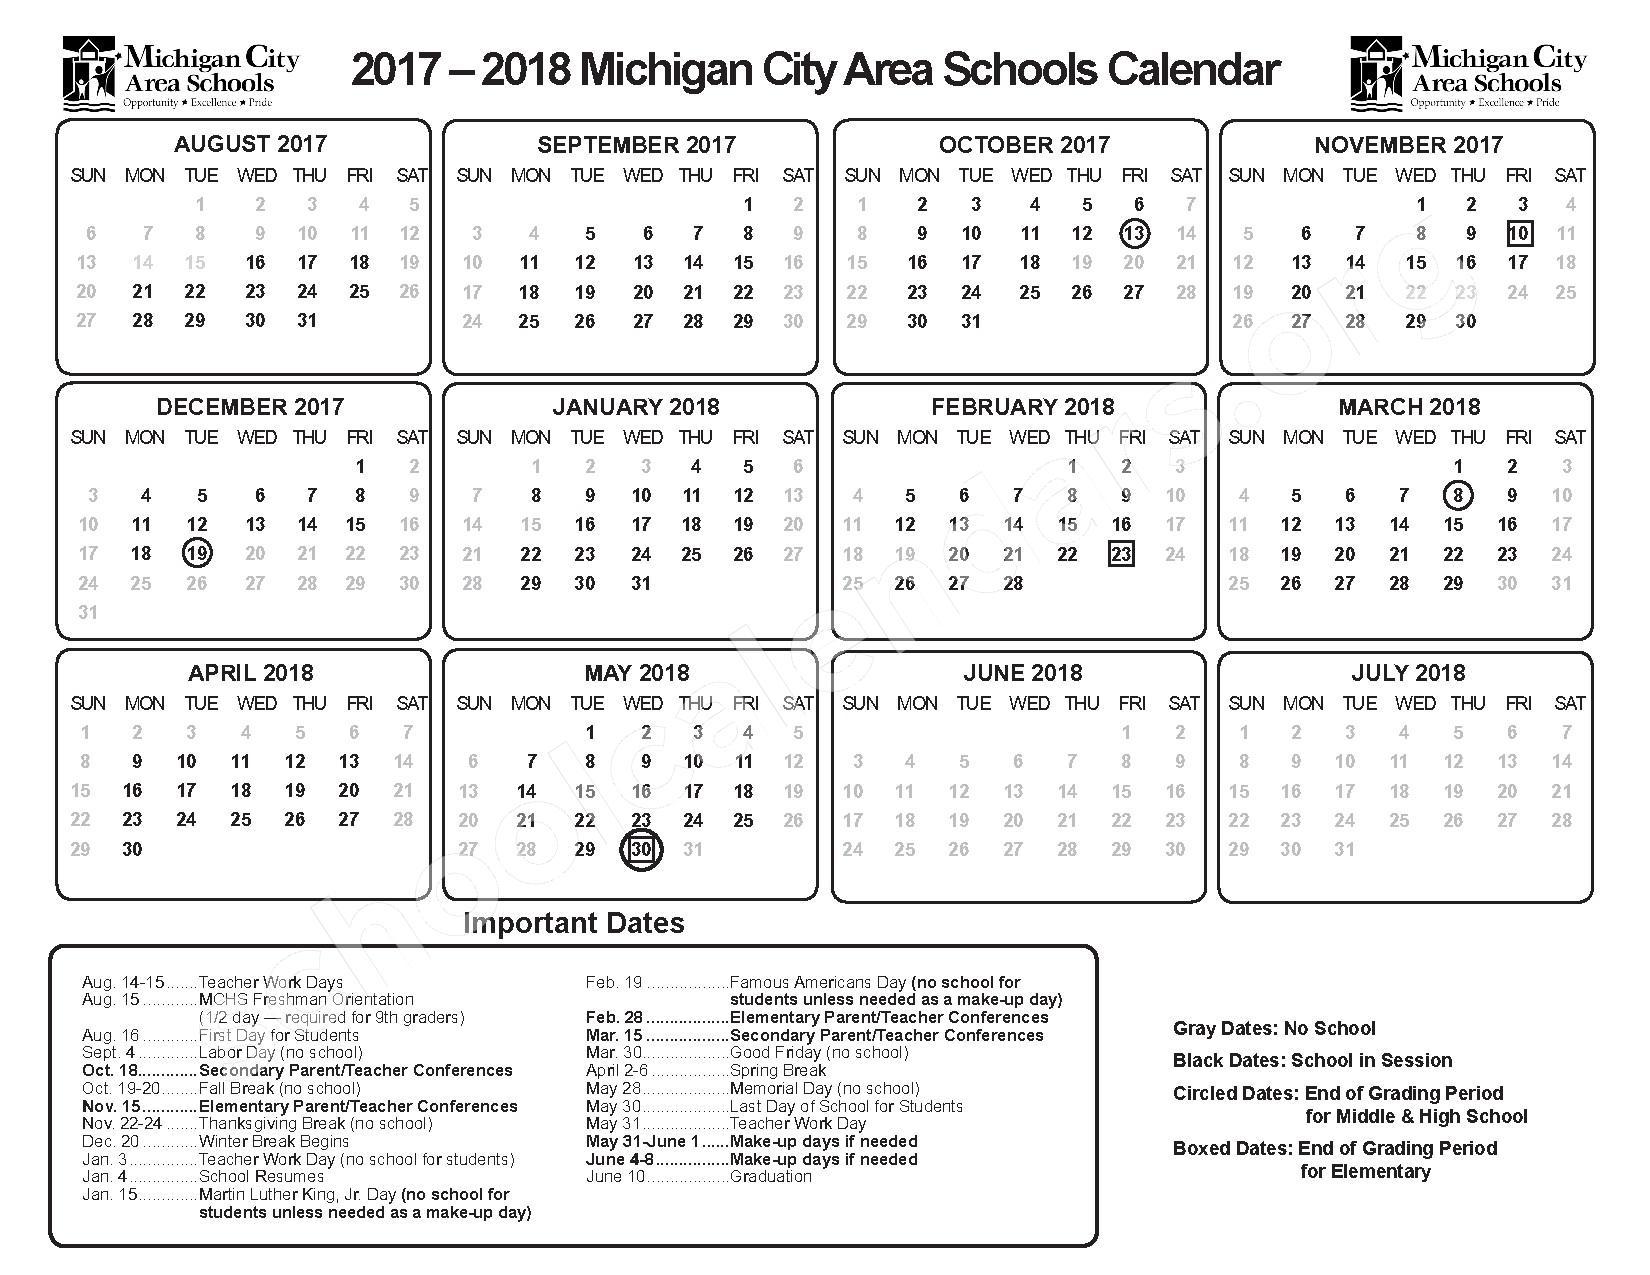 2017 - 2018 School Calendar – Martin T Krueger Middle School – page 1